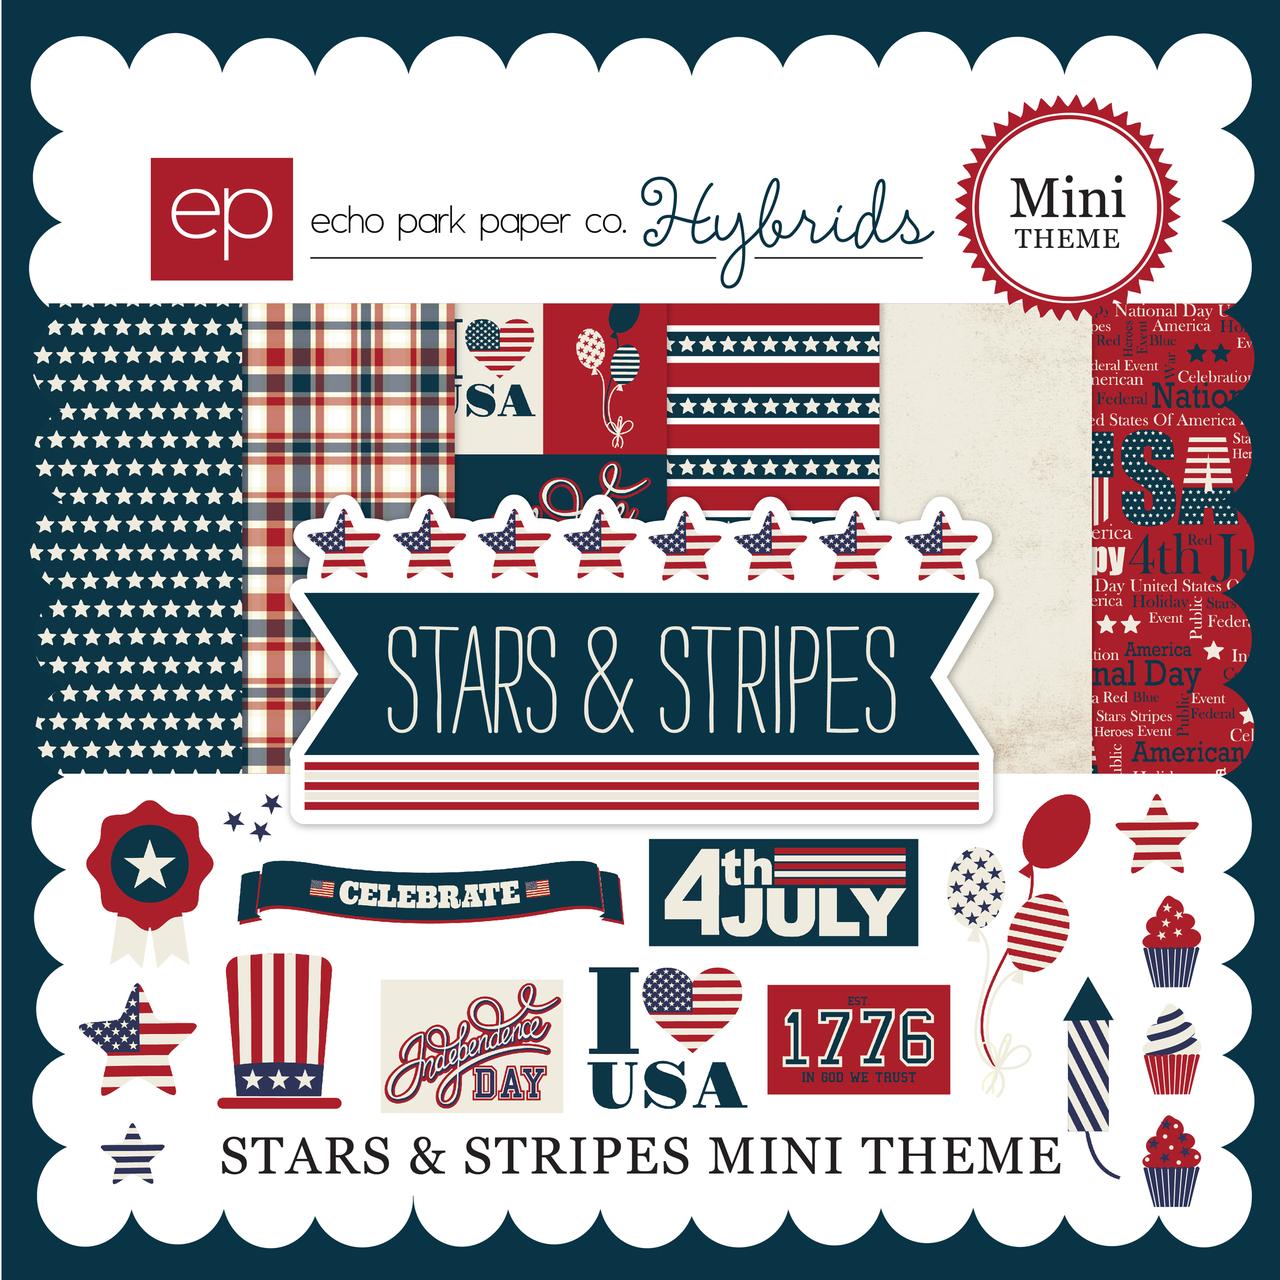 Stars & Stripes Mini-Theme